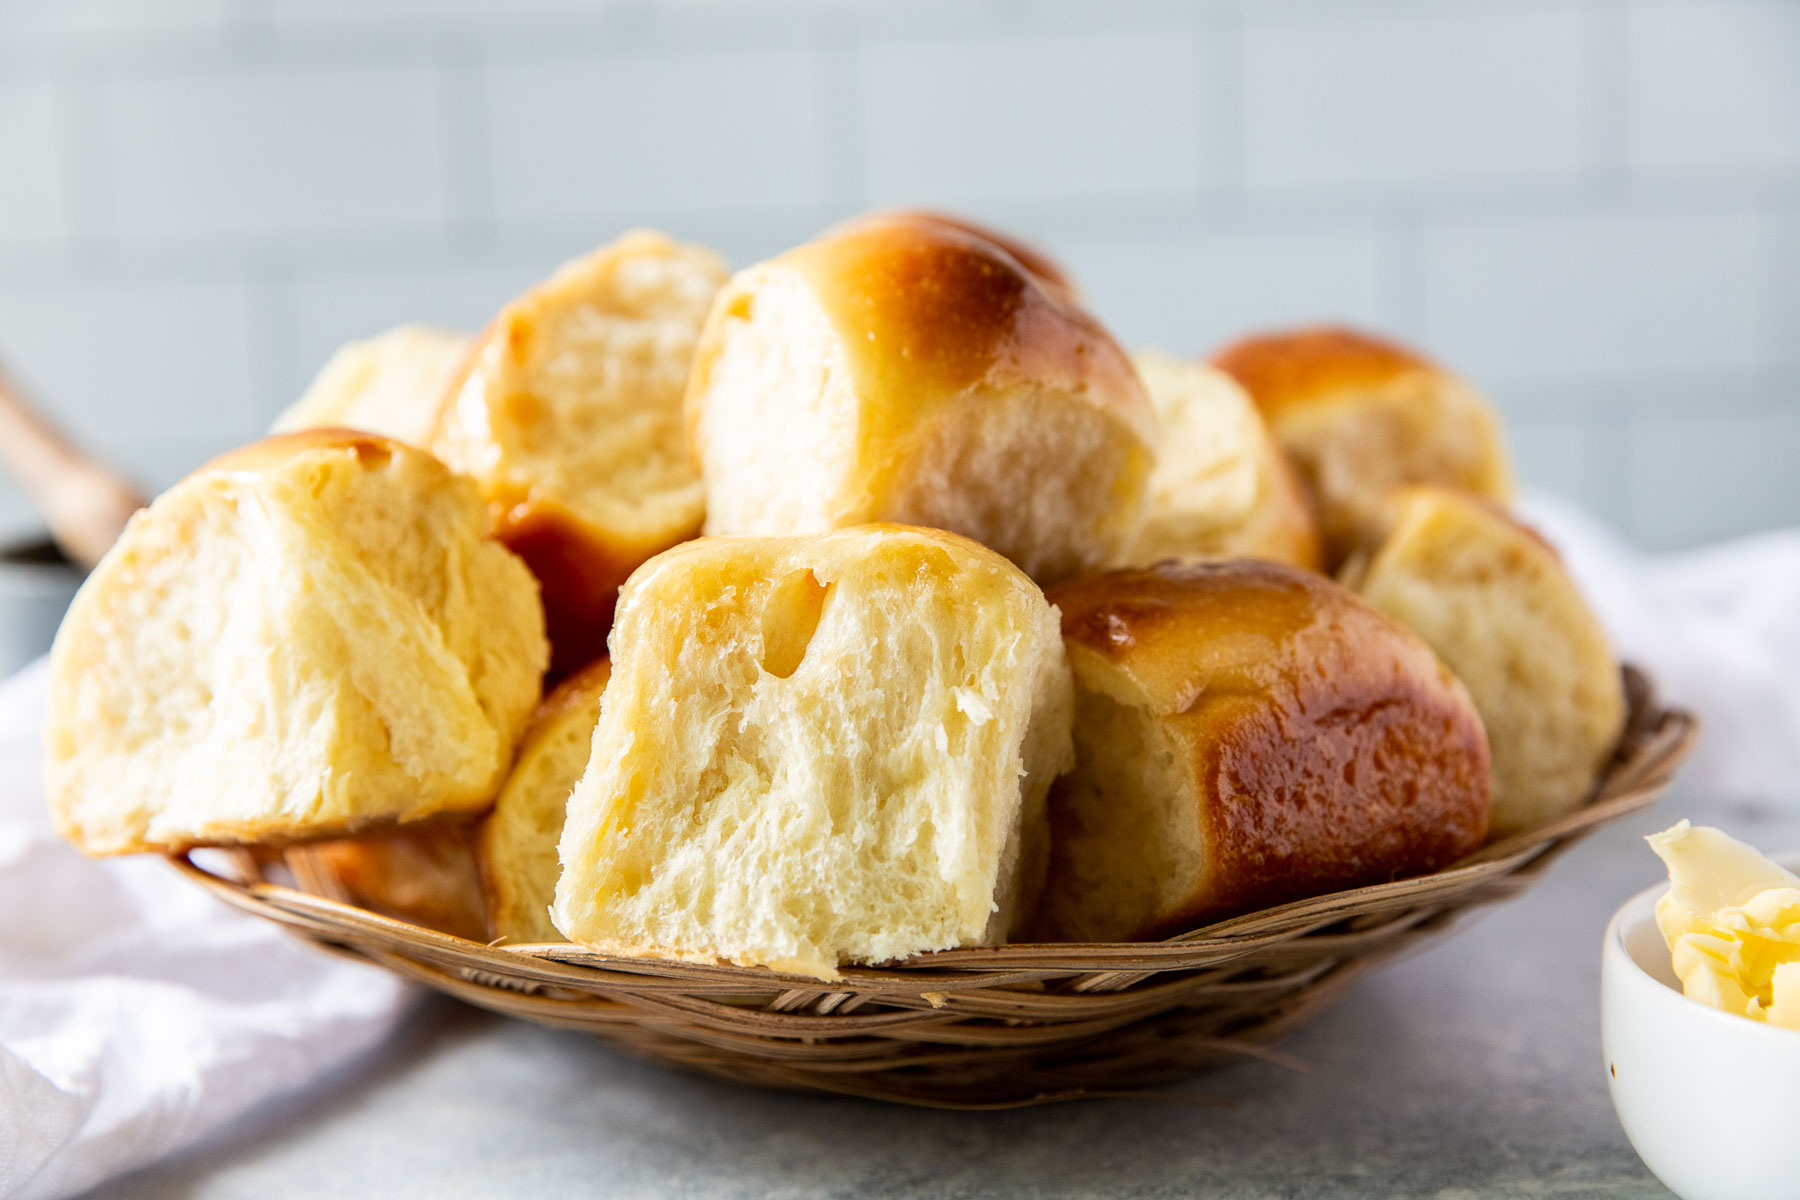 rolls served in a basket